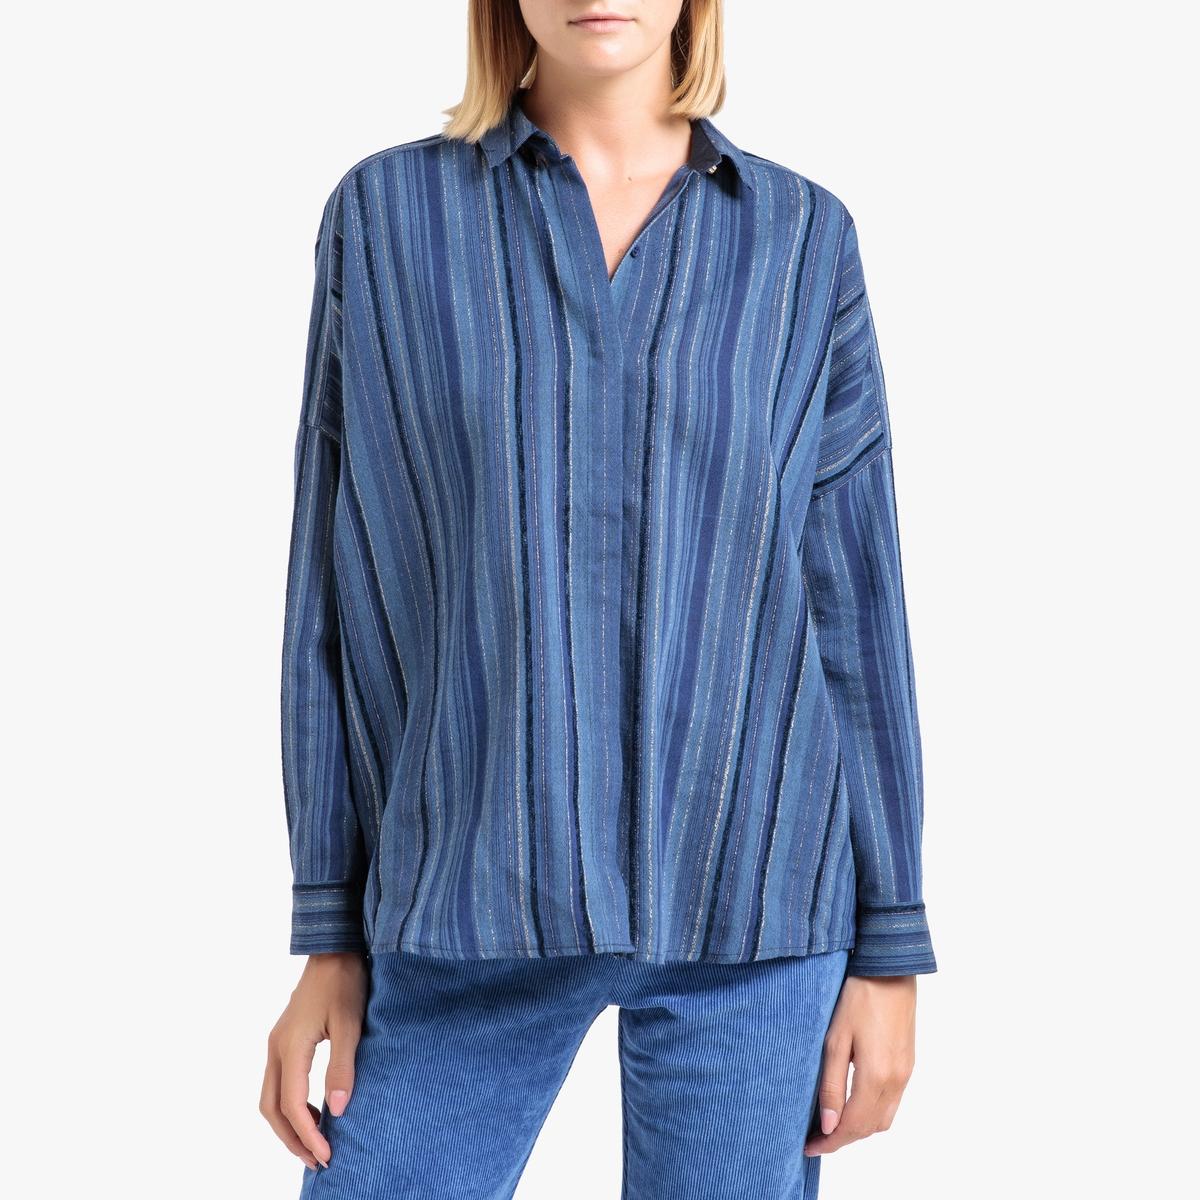 Блузка La Redoute В полоску с длинными рукавами LIMA S синий lee women s jeans lima